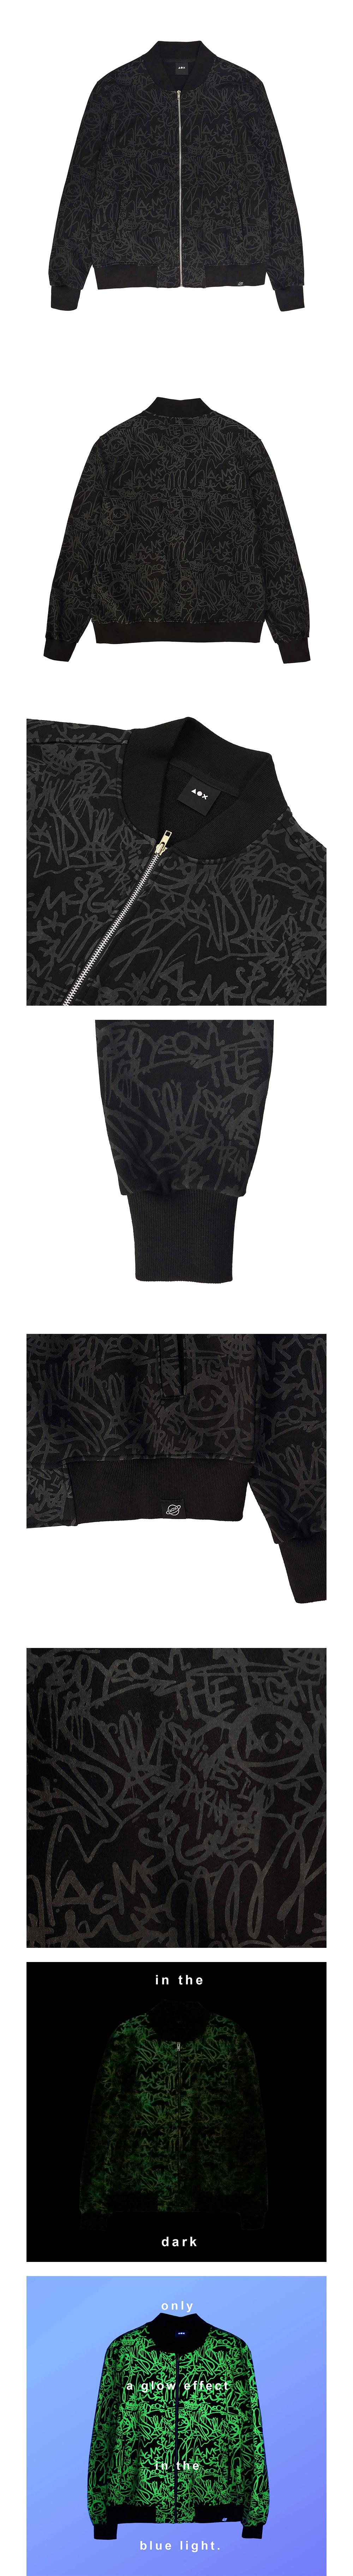 graffitibomberjacket-2_162753.jpg